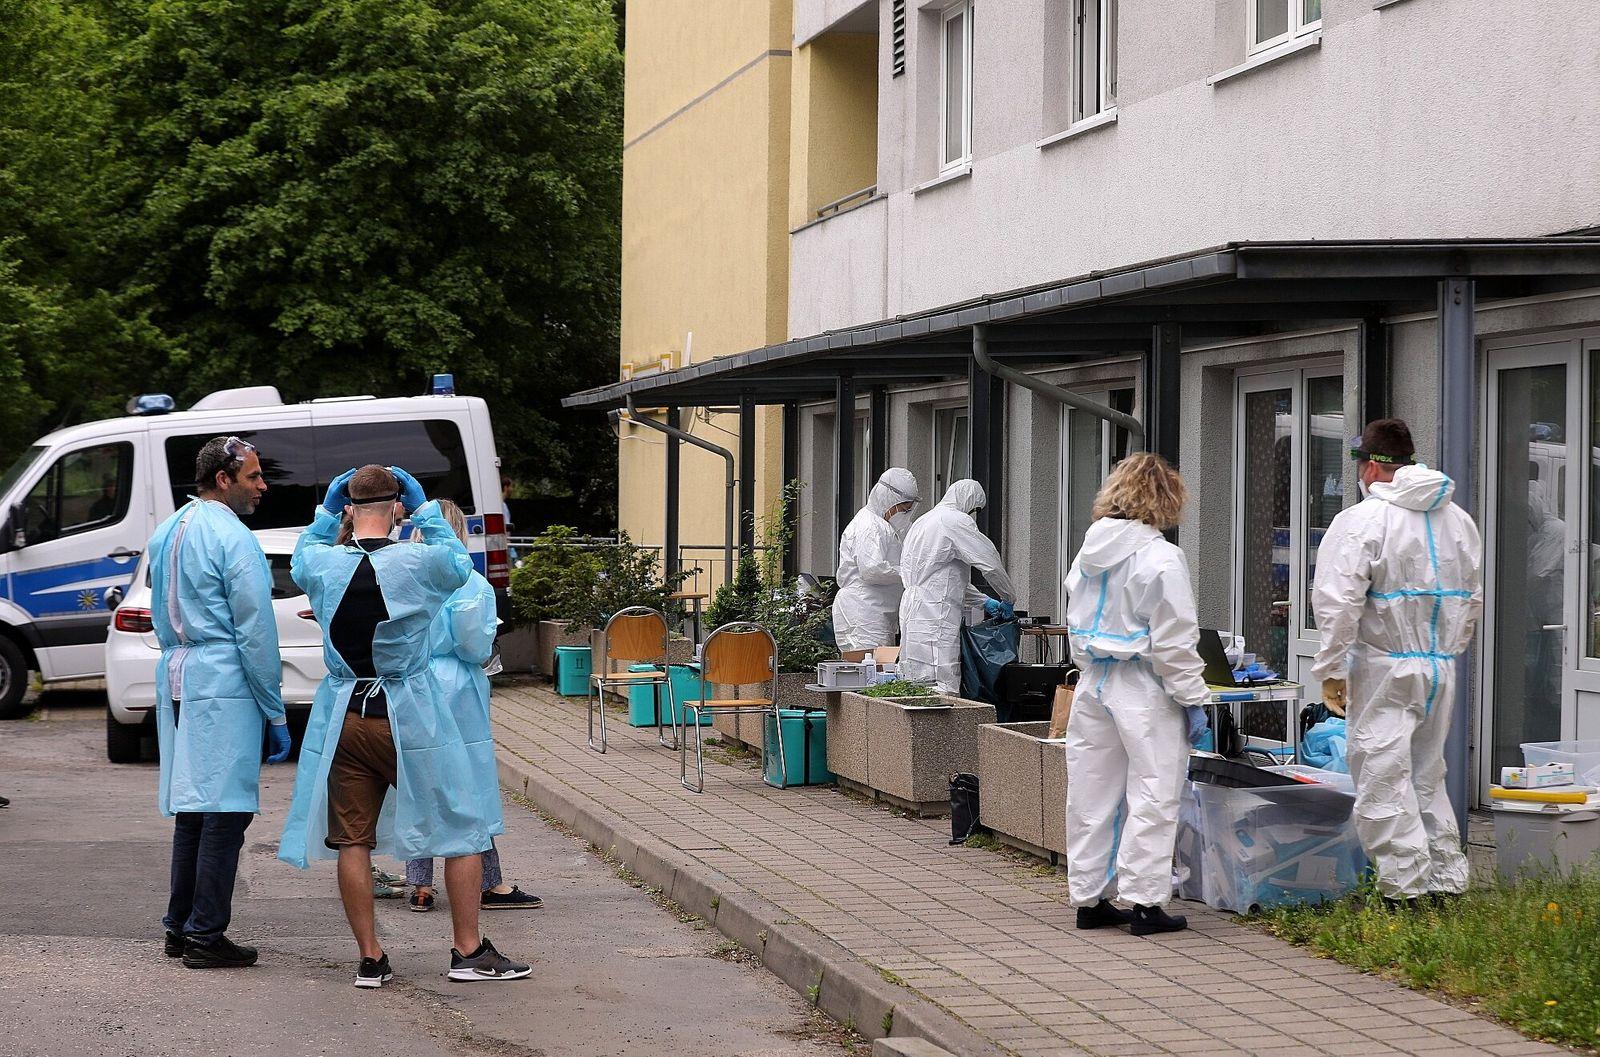 Coronavirus - Hochhaus in Dresden unter Quarantäne